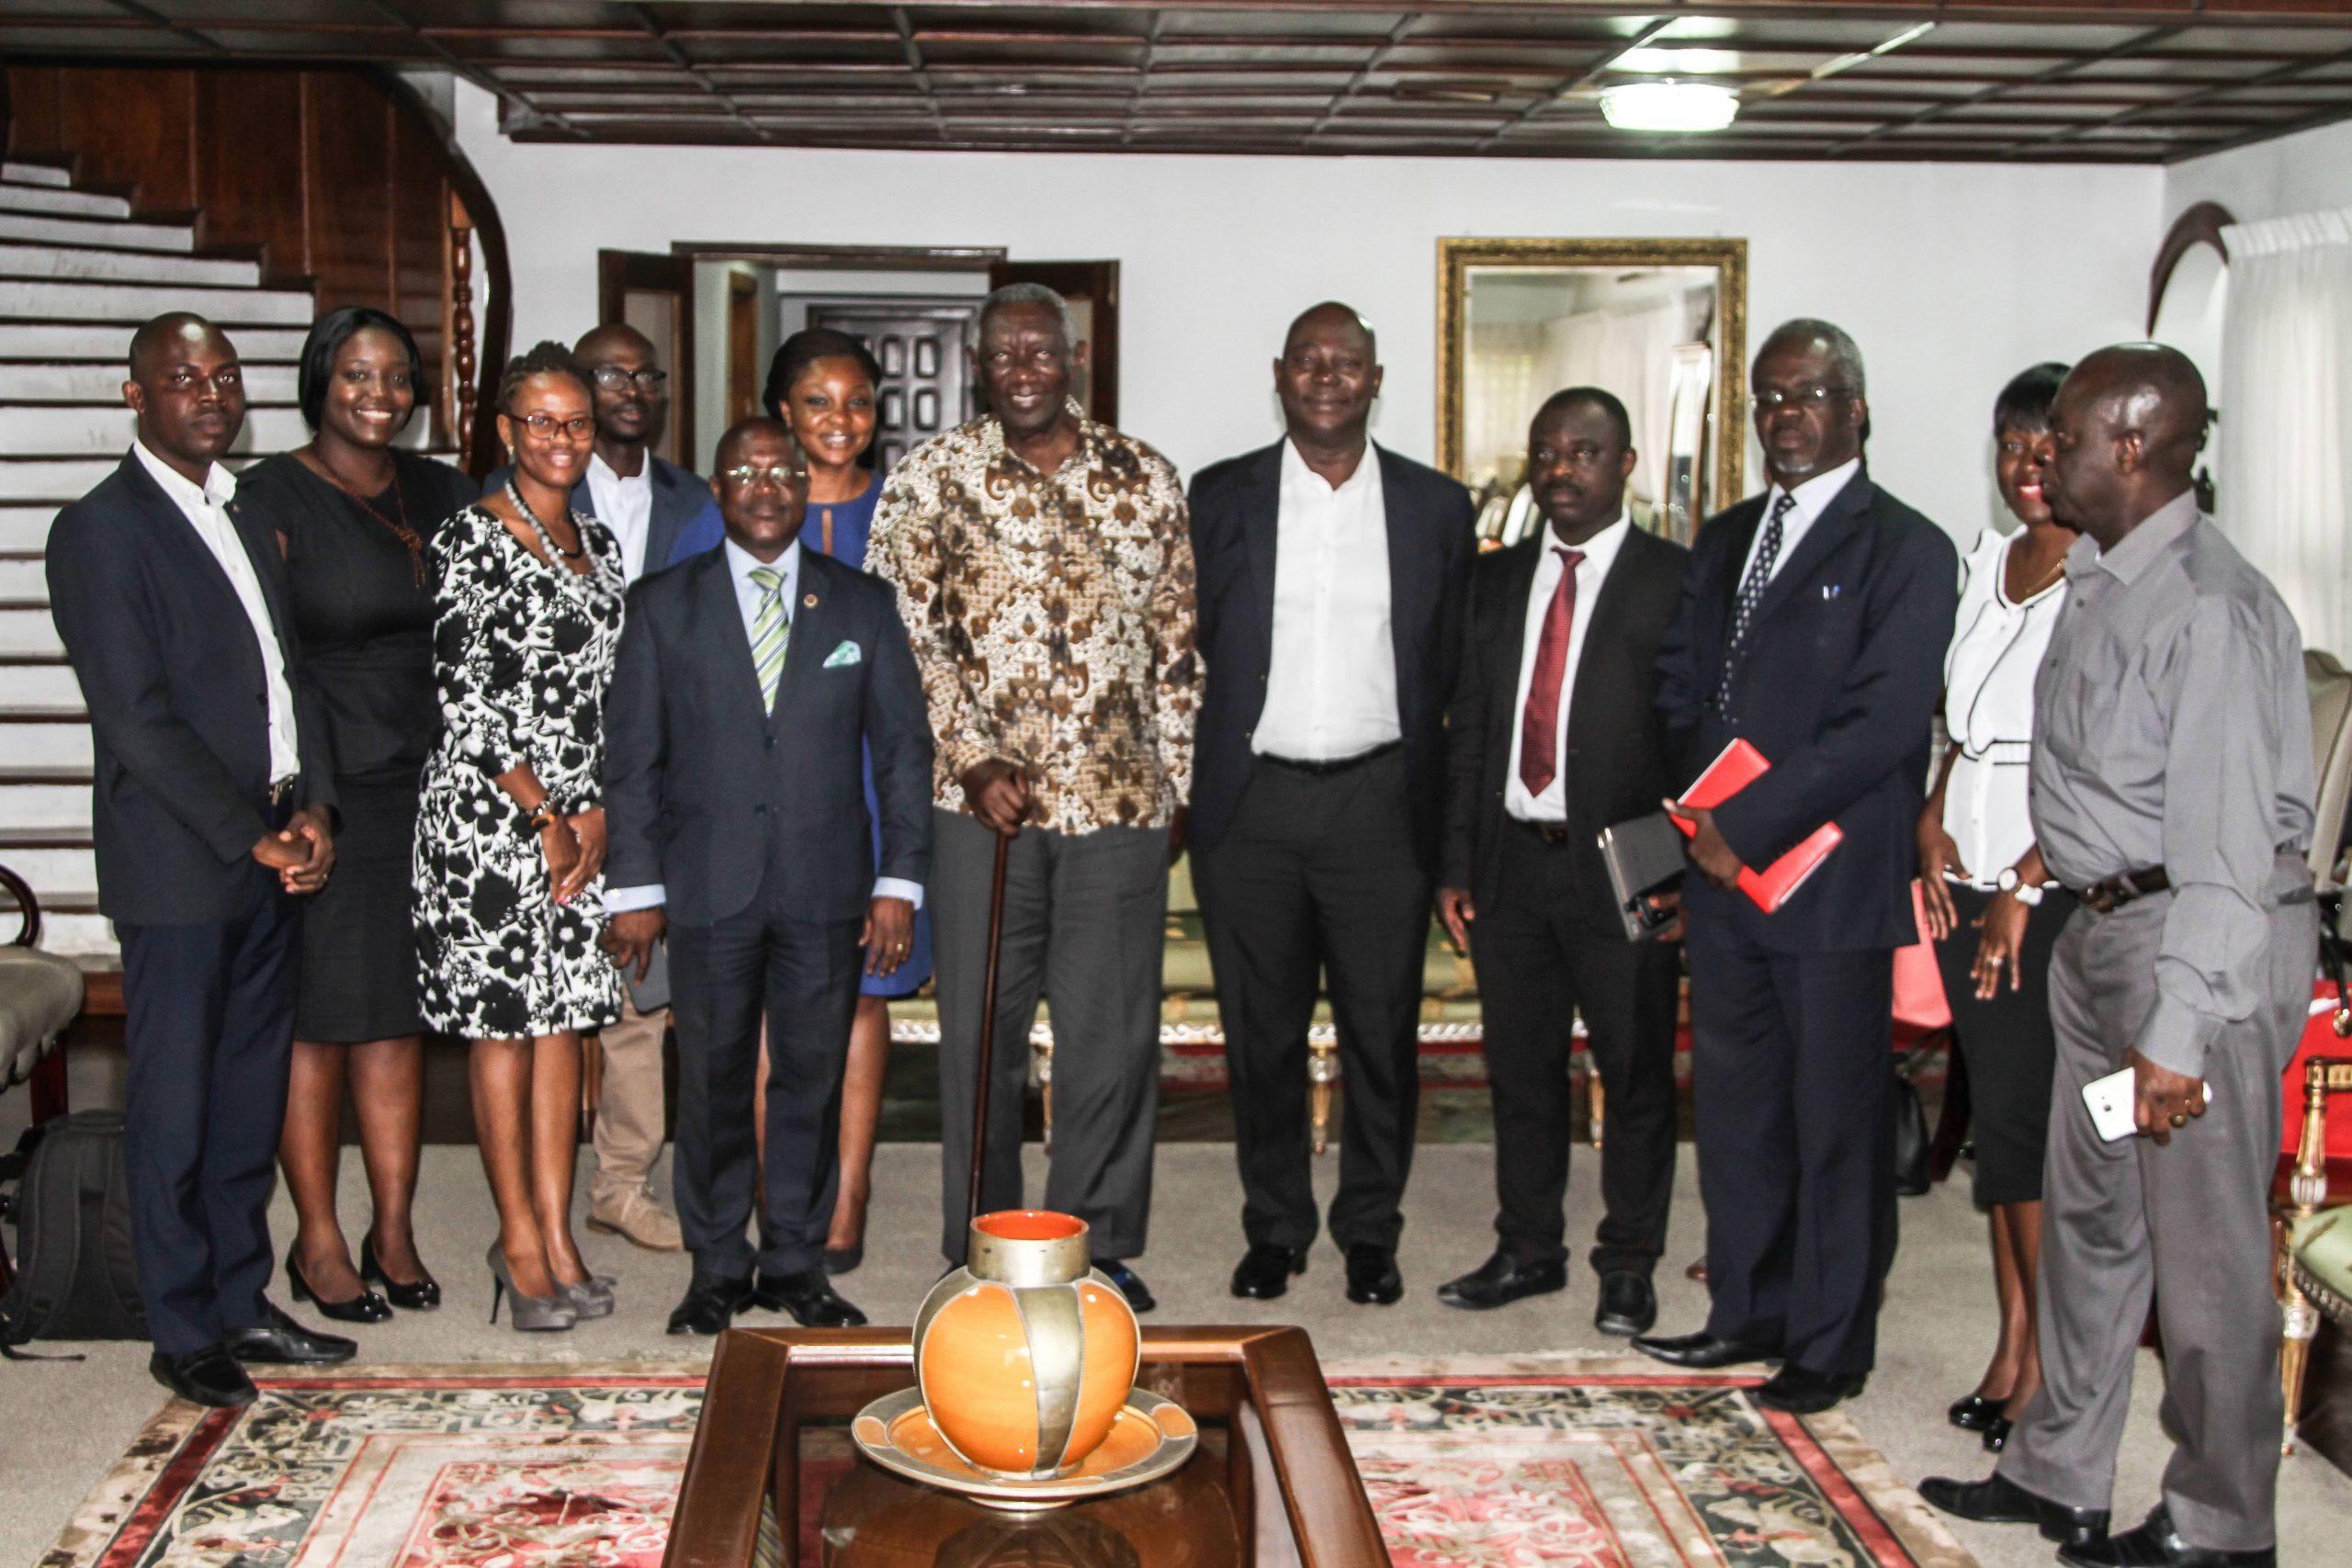 NIA Pays Courtesy Call on Ex President John Agyekum Kuffour 8th August, 2017